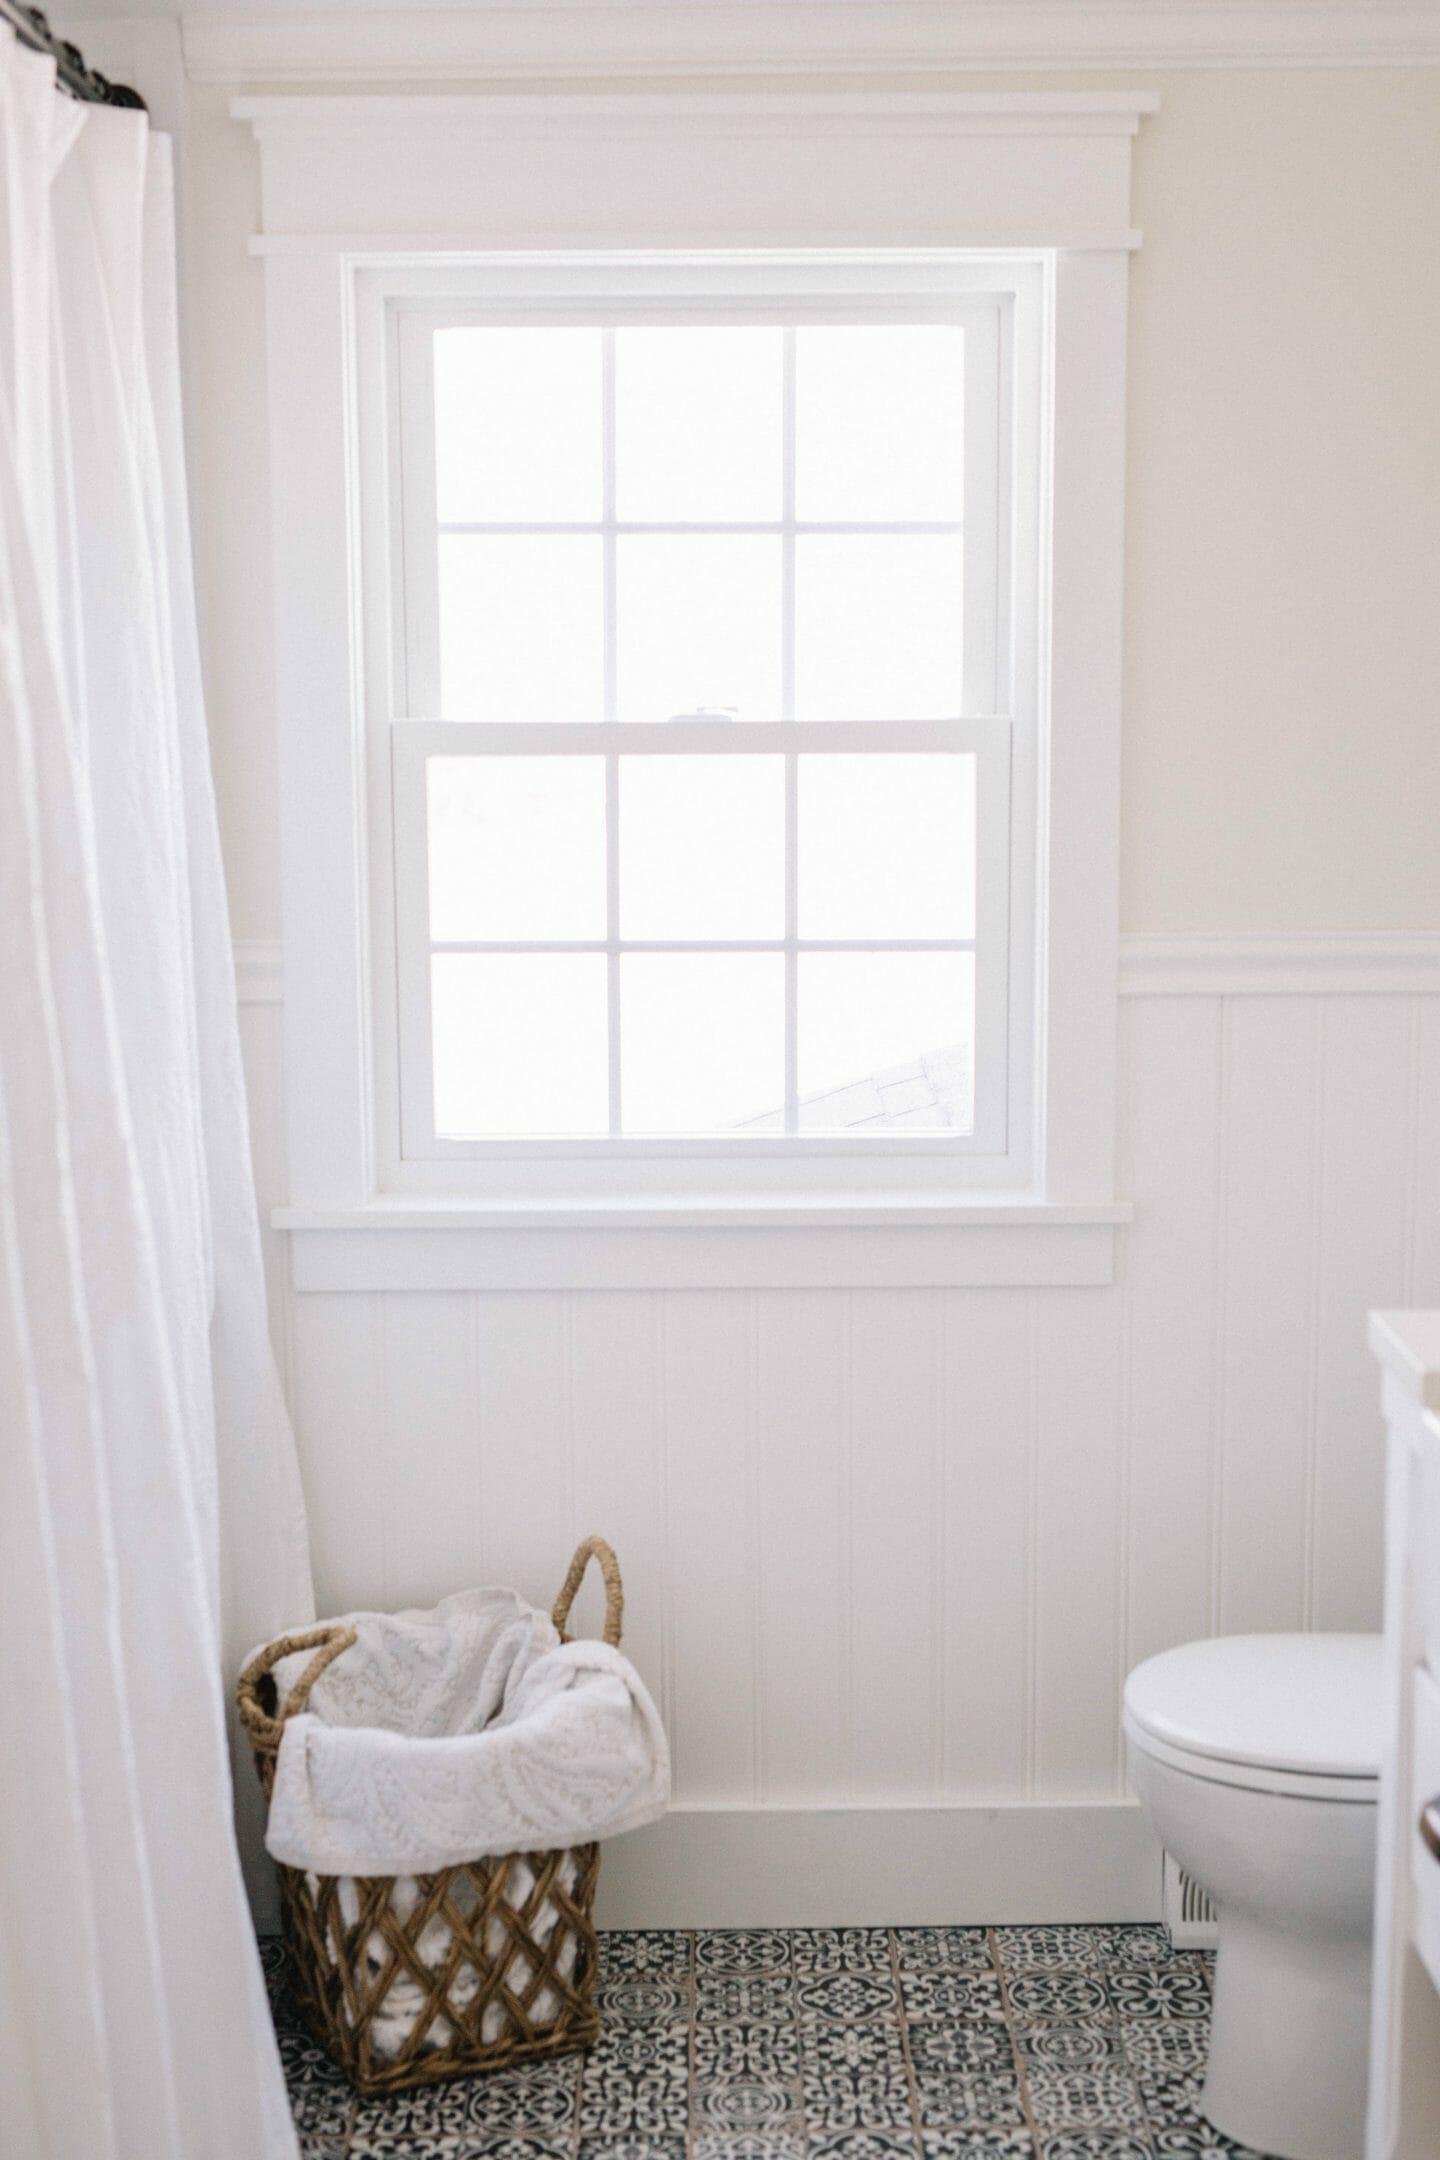 Farmhouse Bathroom Makeover // Bathroom Renovation Ideas with sliding barn door, medicine cabinets & black and white tile floors